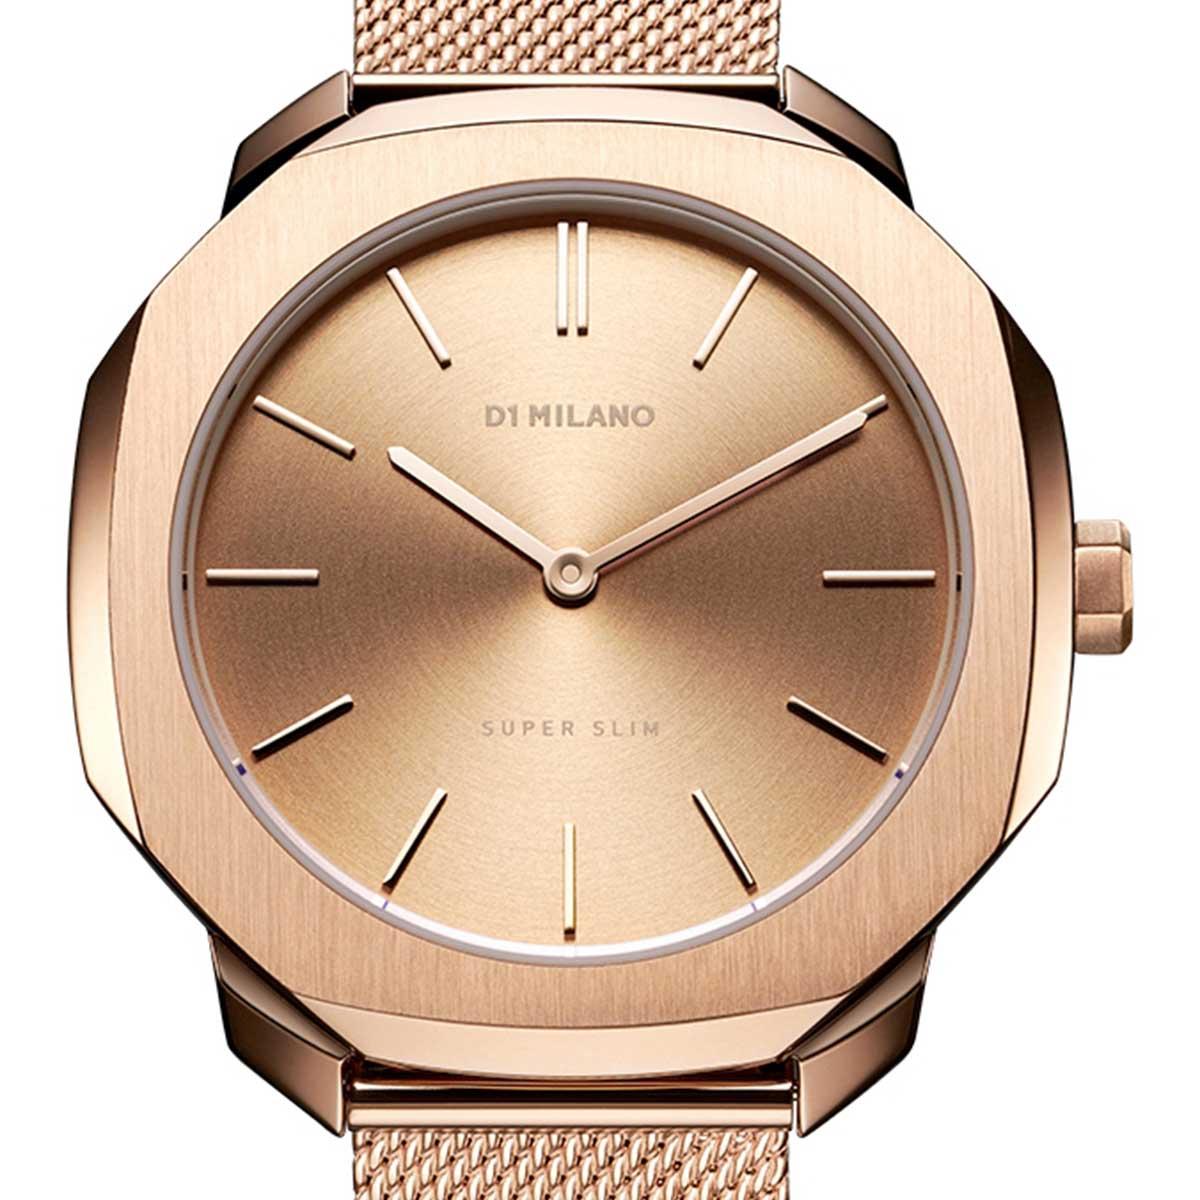 D1 MILANO ディーワンミラノ 電池式クォーツ 腕時計 [SSML02] 並行輸入品